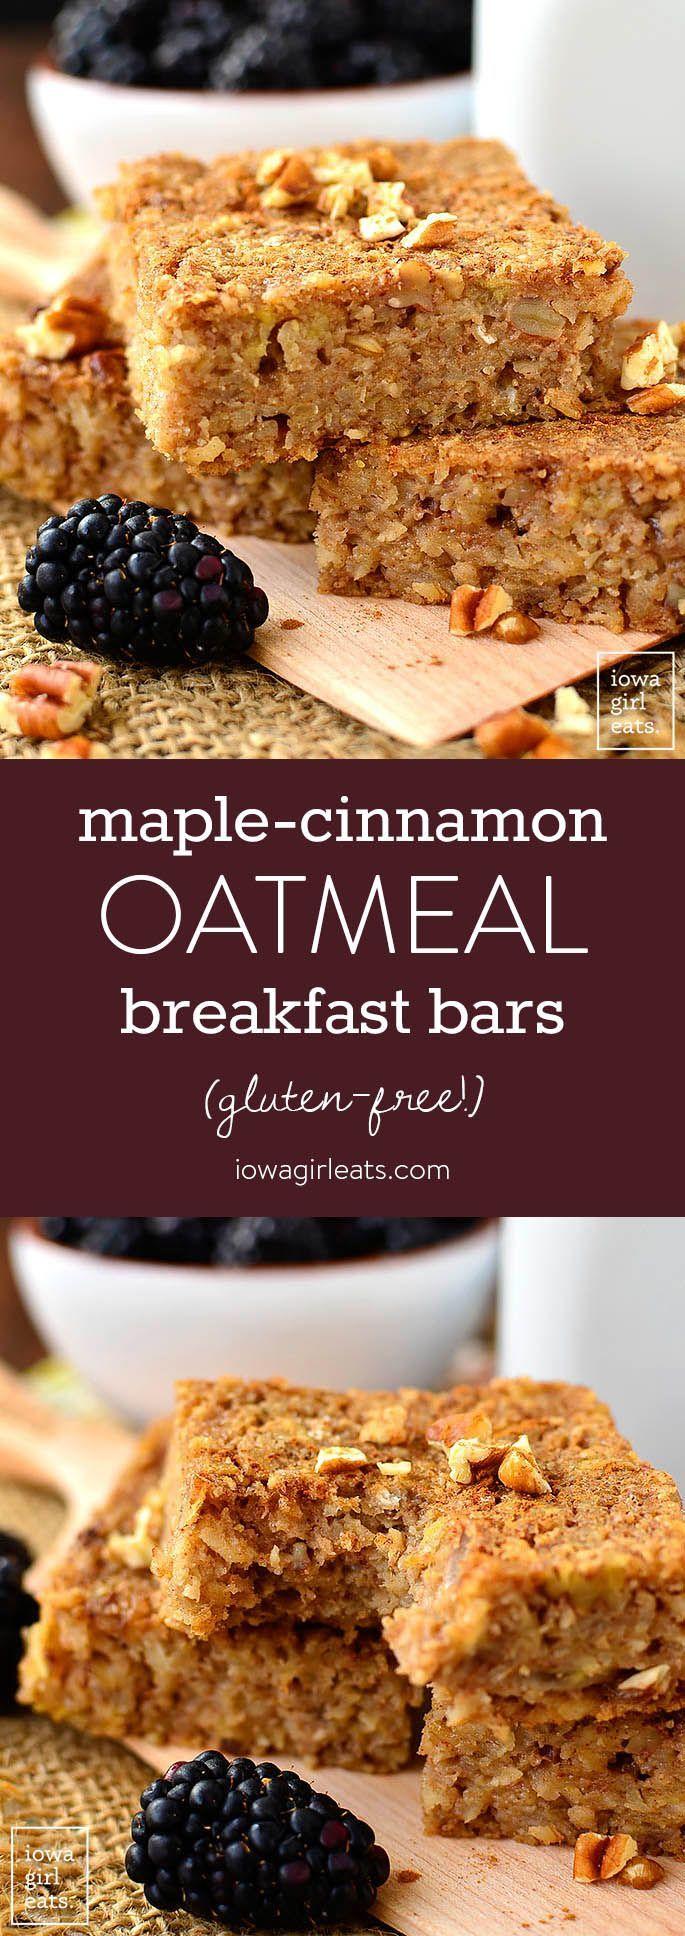 Maple-Cinnamon Oatmeal Breakfast Bars arenaturally sweetened and gluten-free. Enjoy as a healthy snack or easy, on-the-go breakfast!   iowagirleats.com #glutenfree